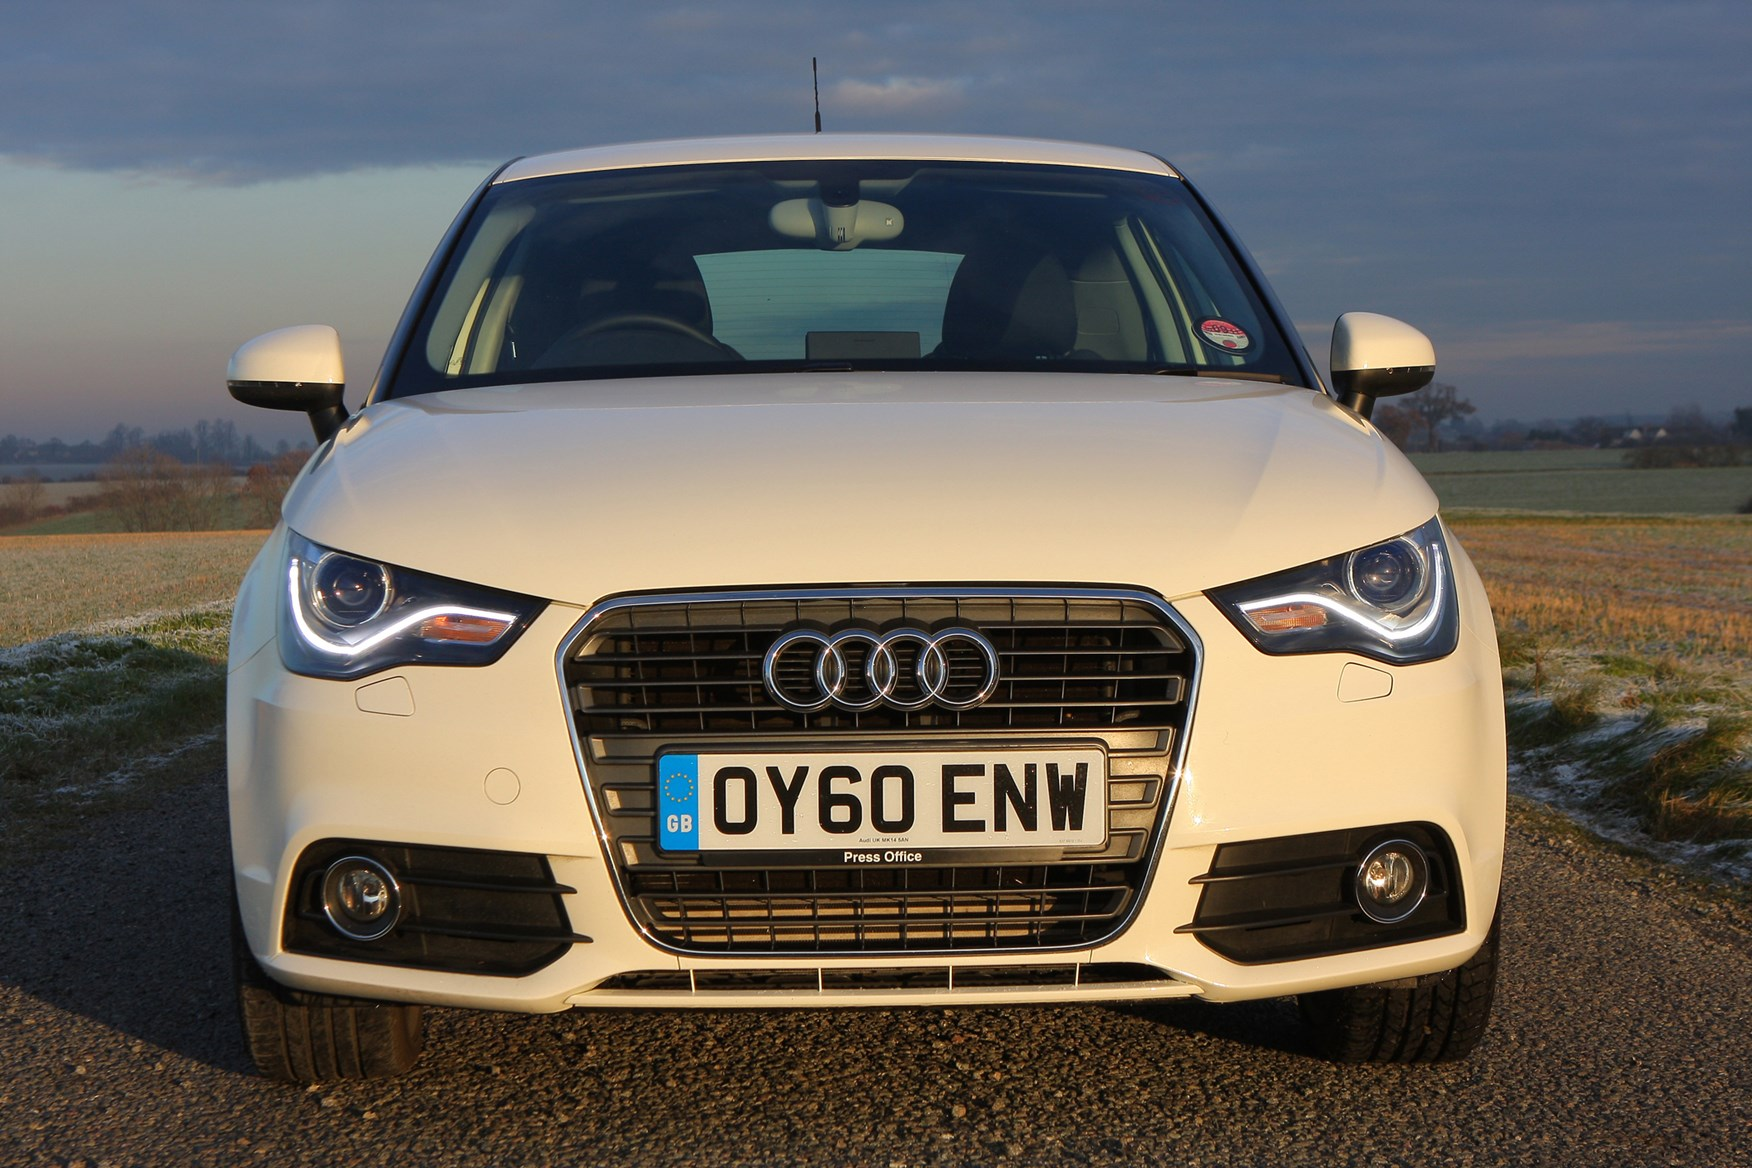 New Audi cars  Reviews of Audi models  carwow